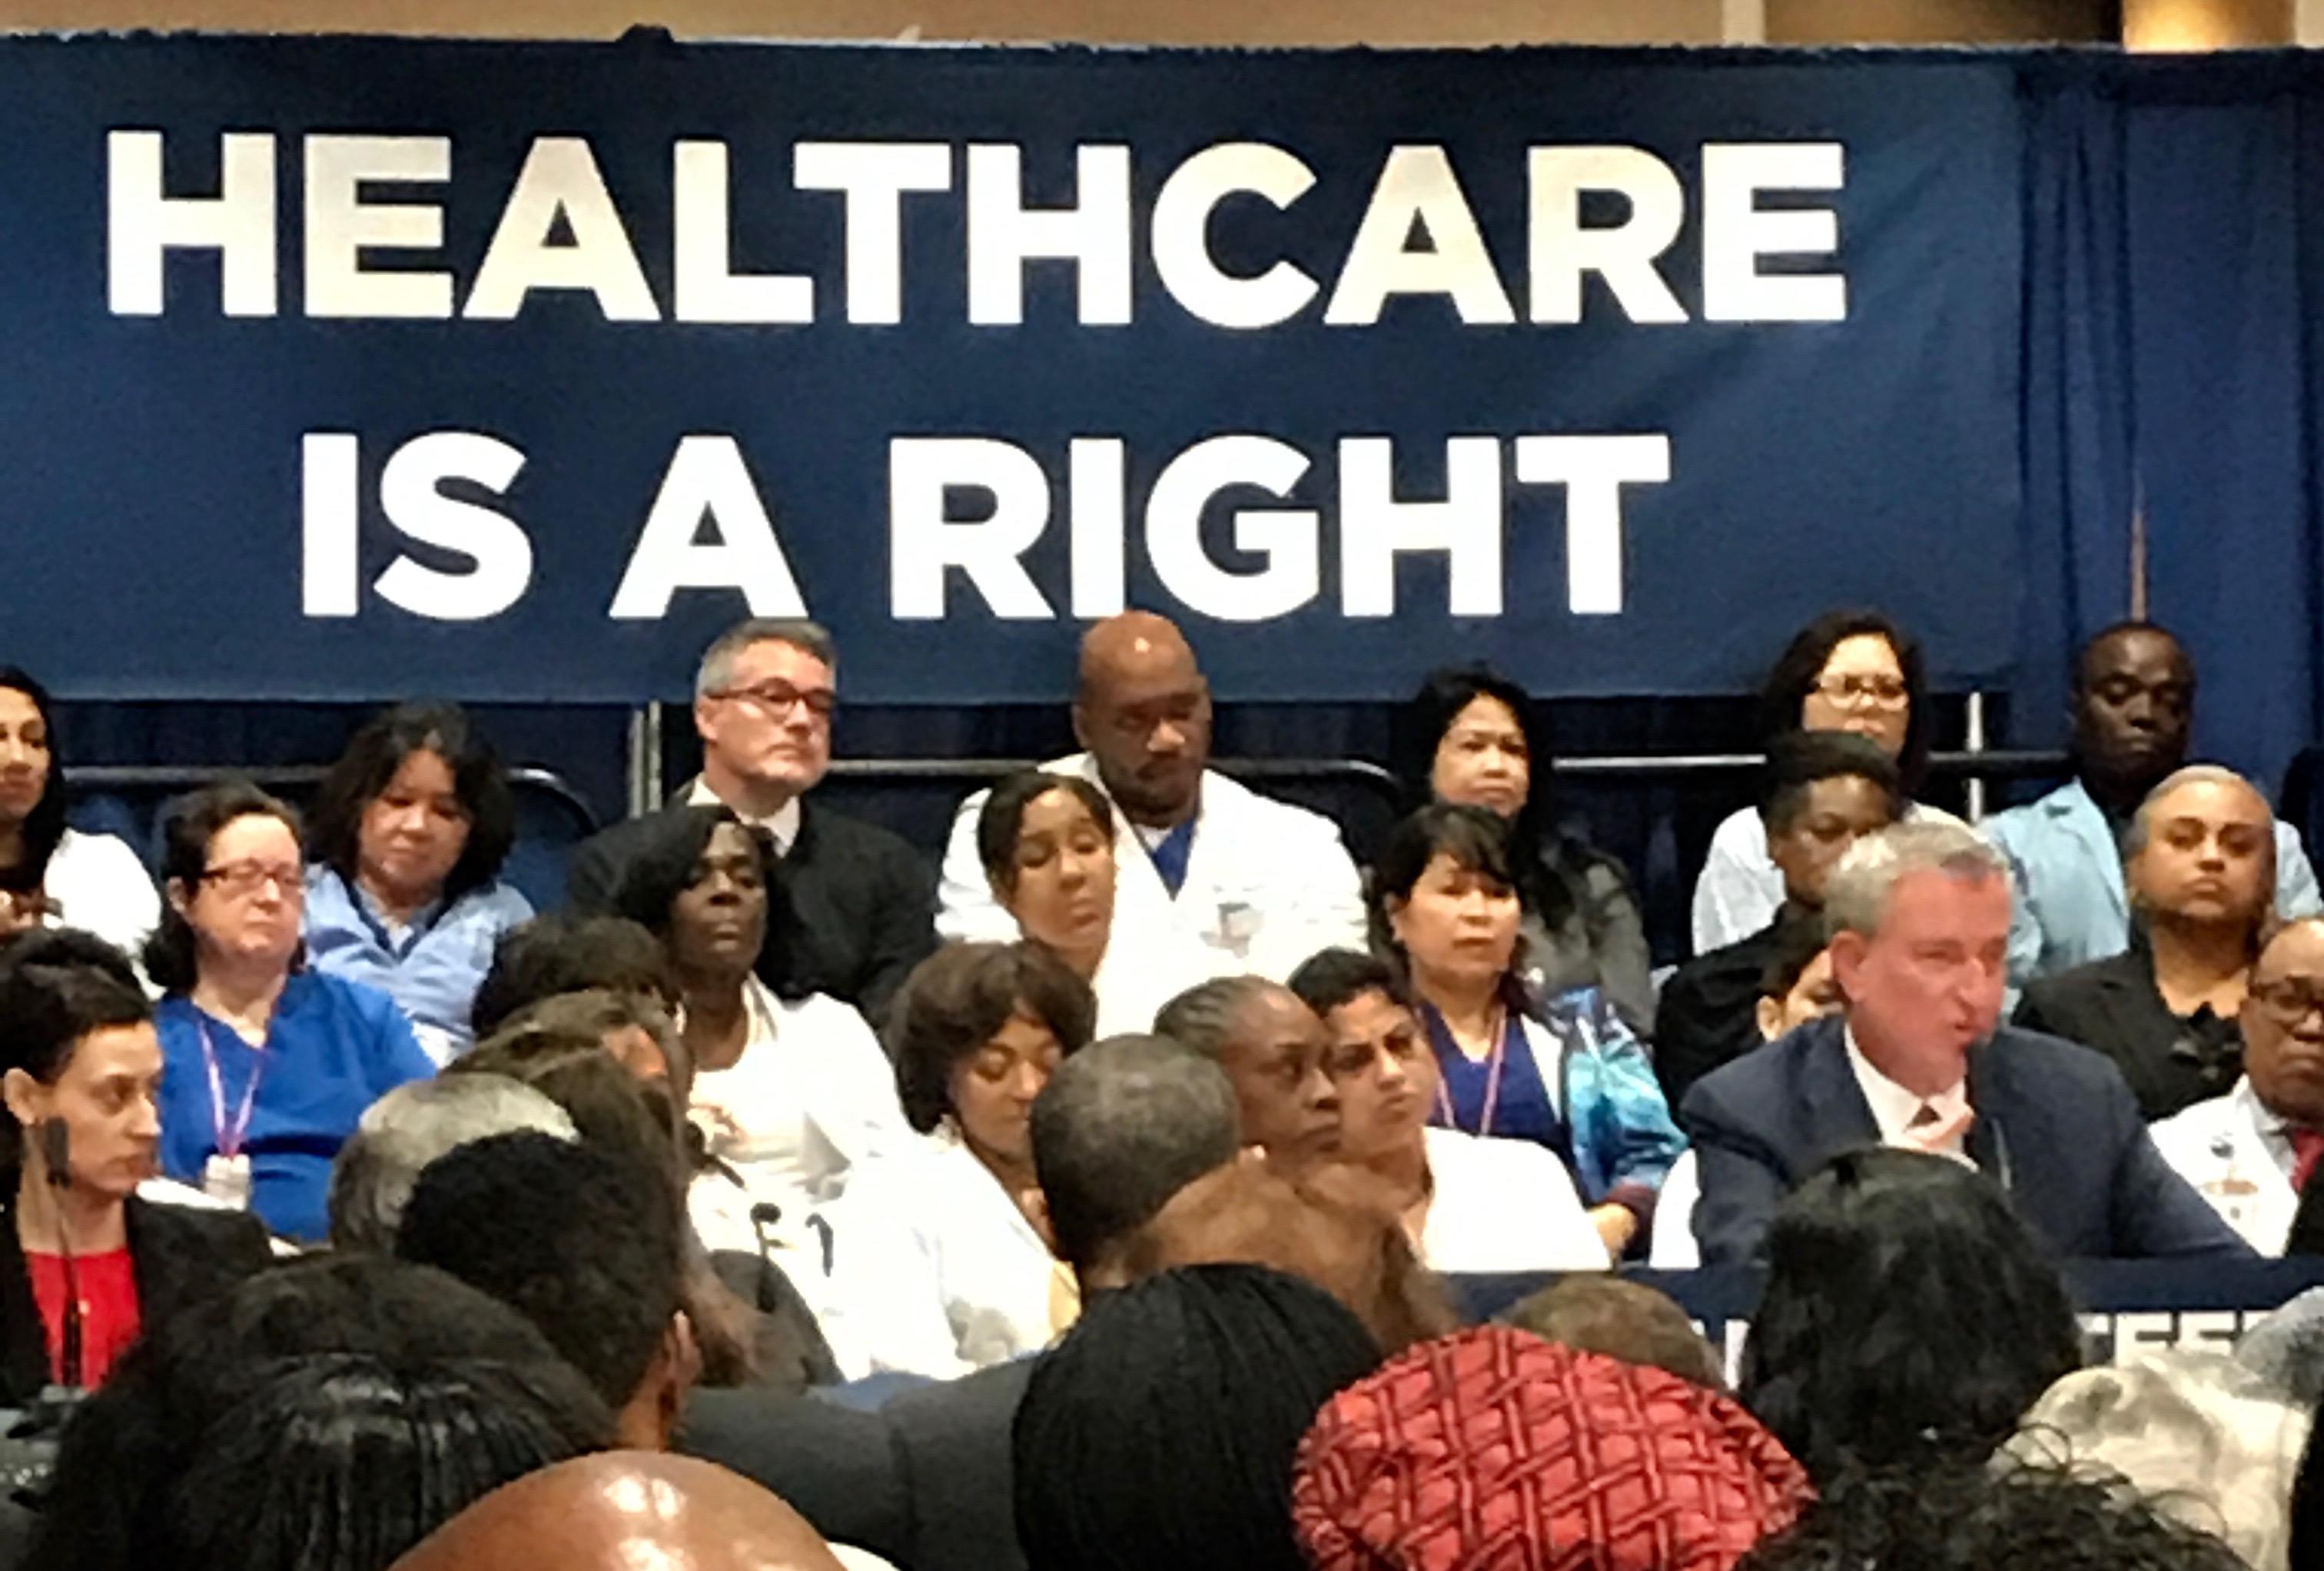 De Blasio 'Guarantees Healthcare' for all 600,000 Uninsured New Yorkers